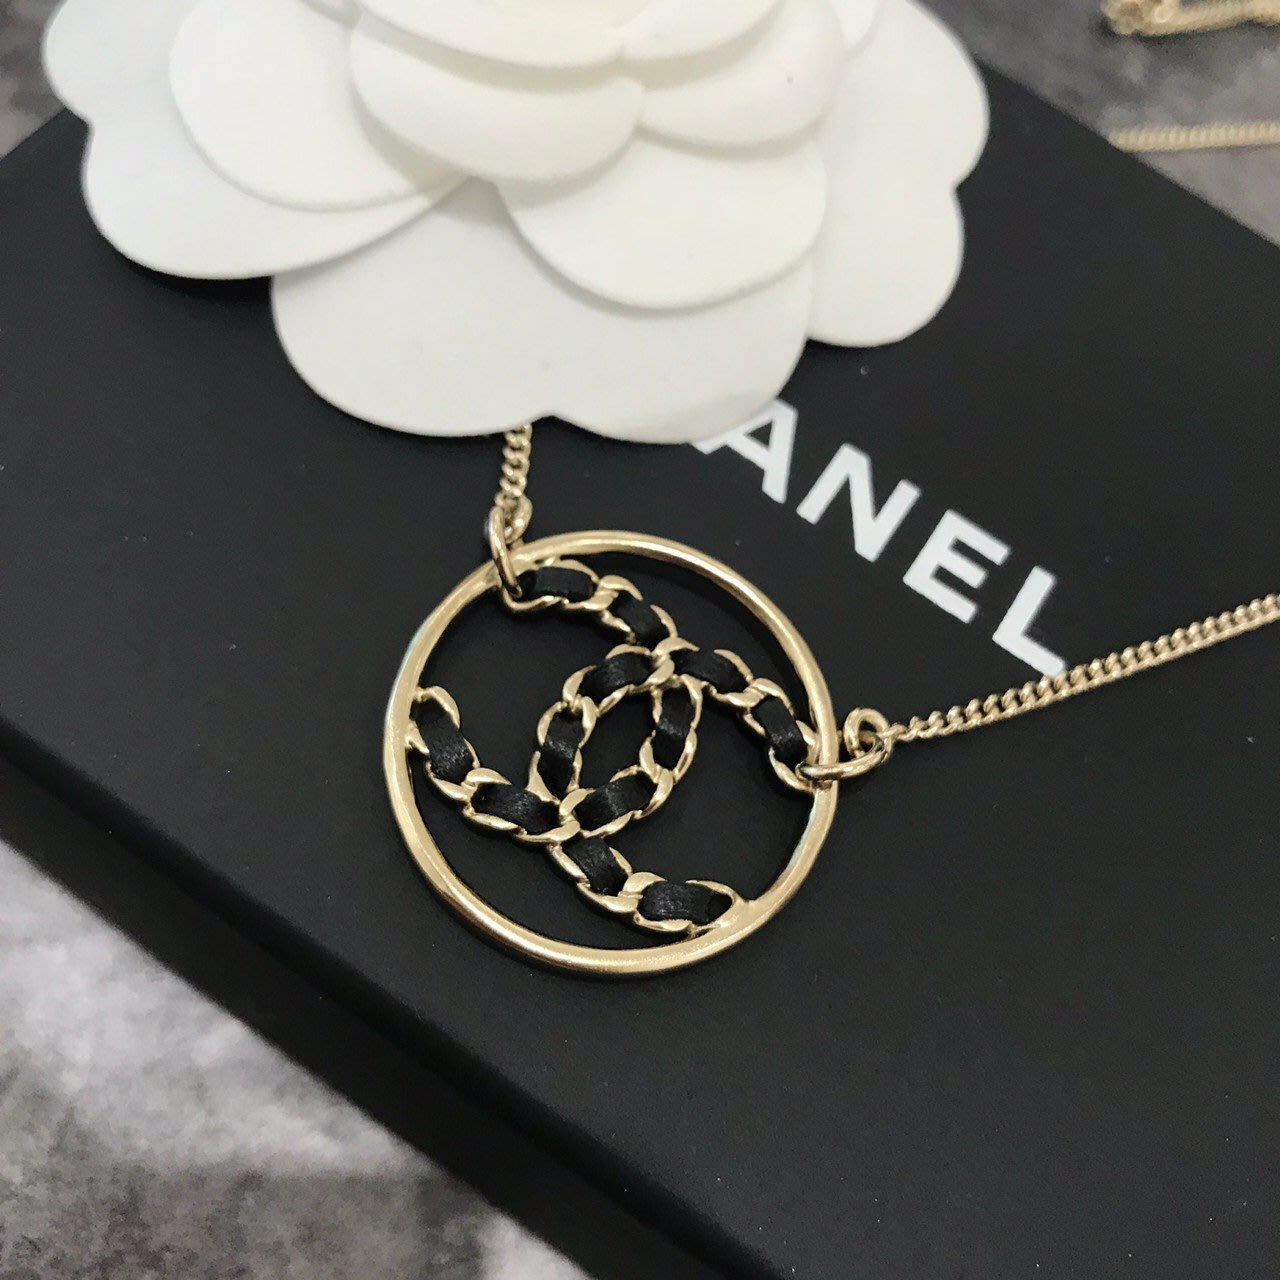 Chanel金色logo 黑色皮革項鍊